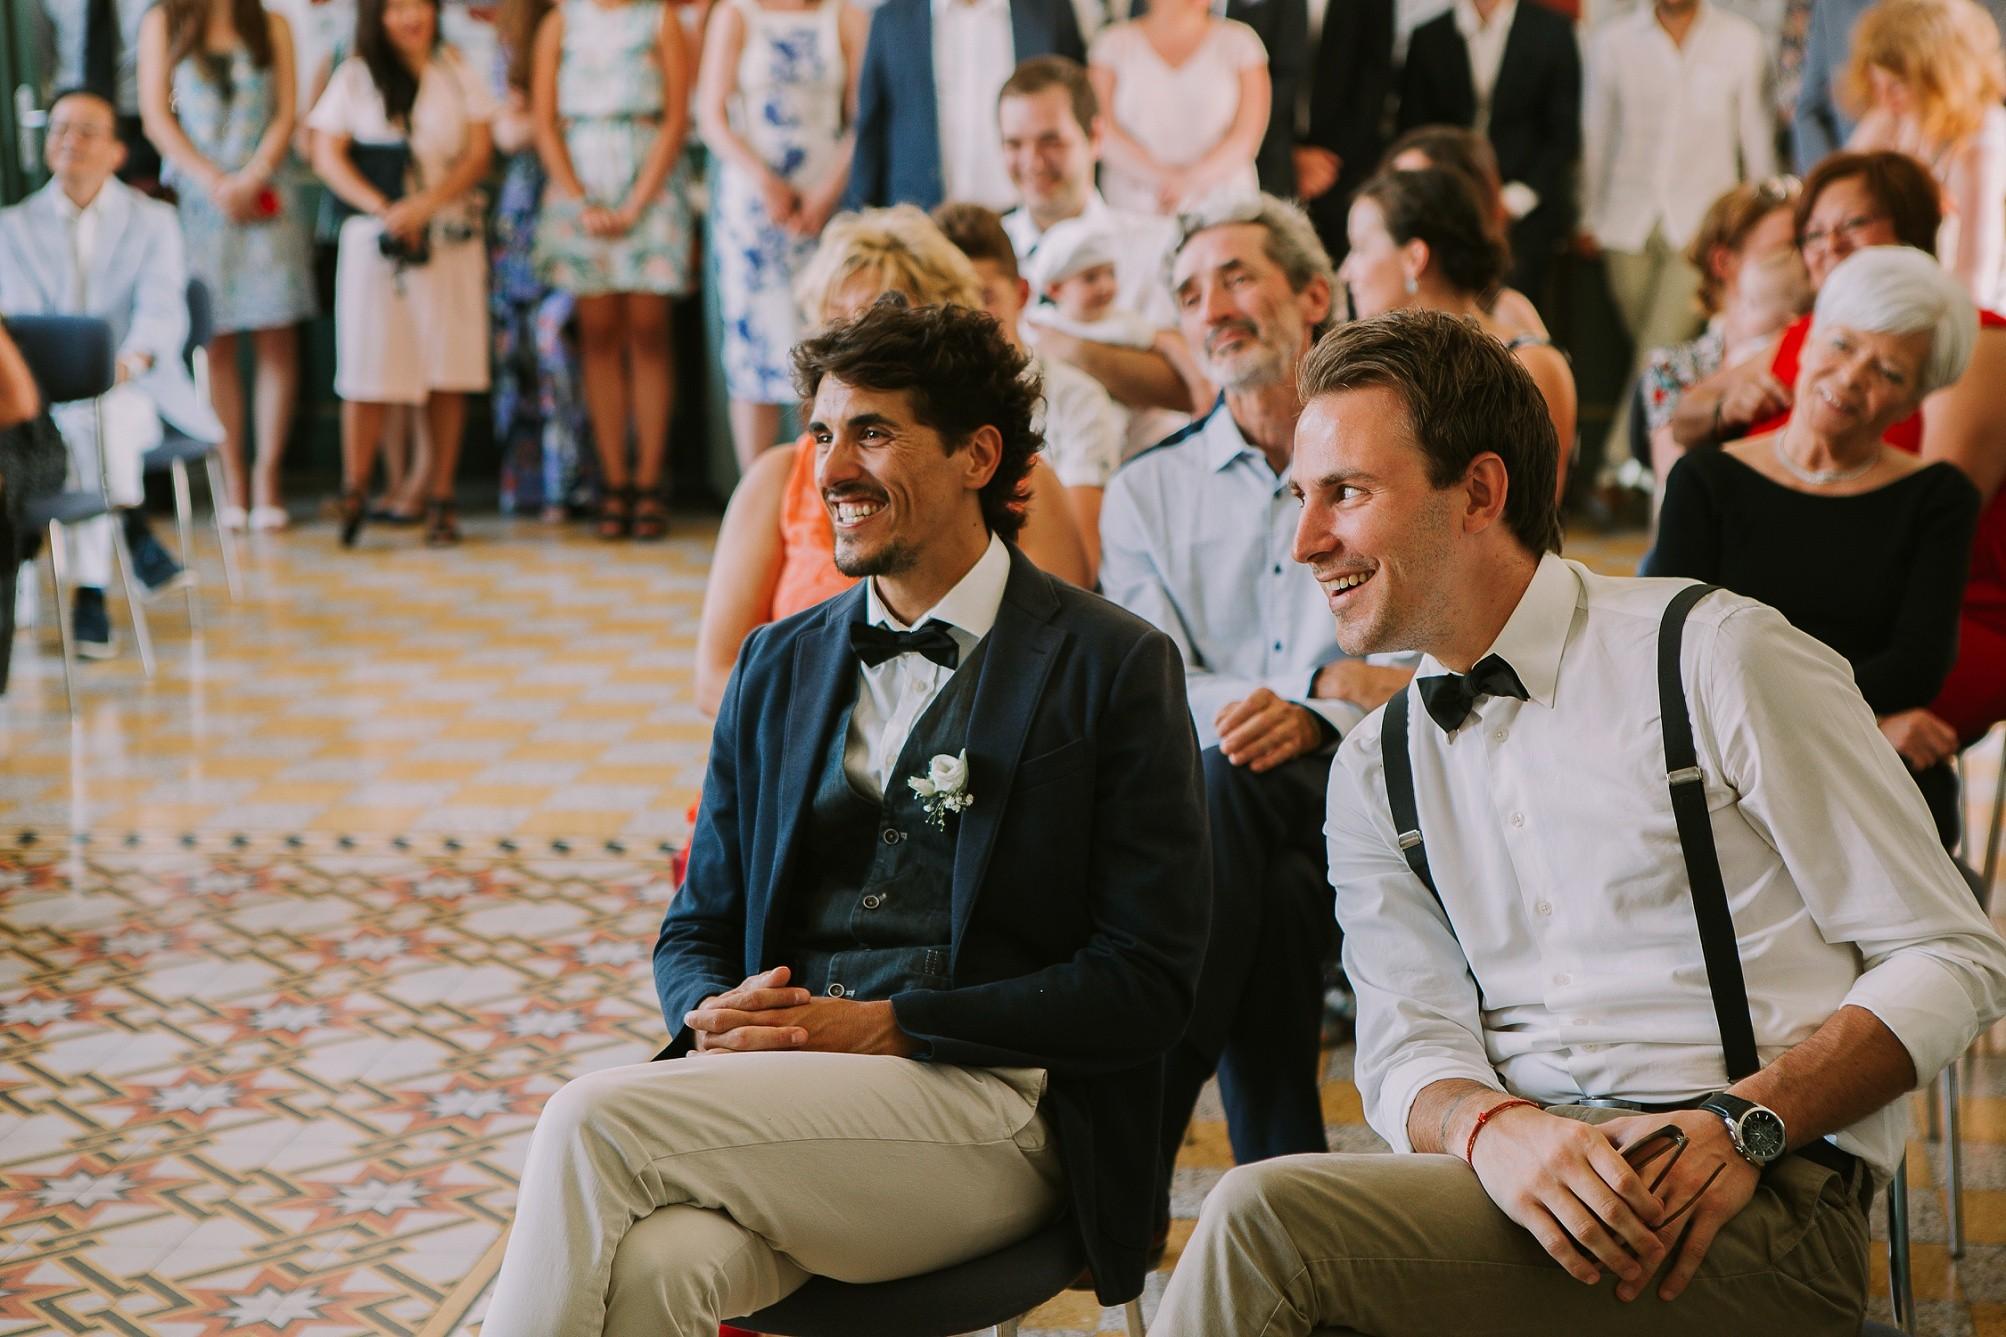 katerynaphotos-mariage-photographe-puyloubier-provence-aix-en-provence-sud-de-la-france_0362.jpg